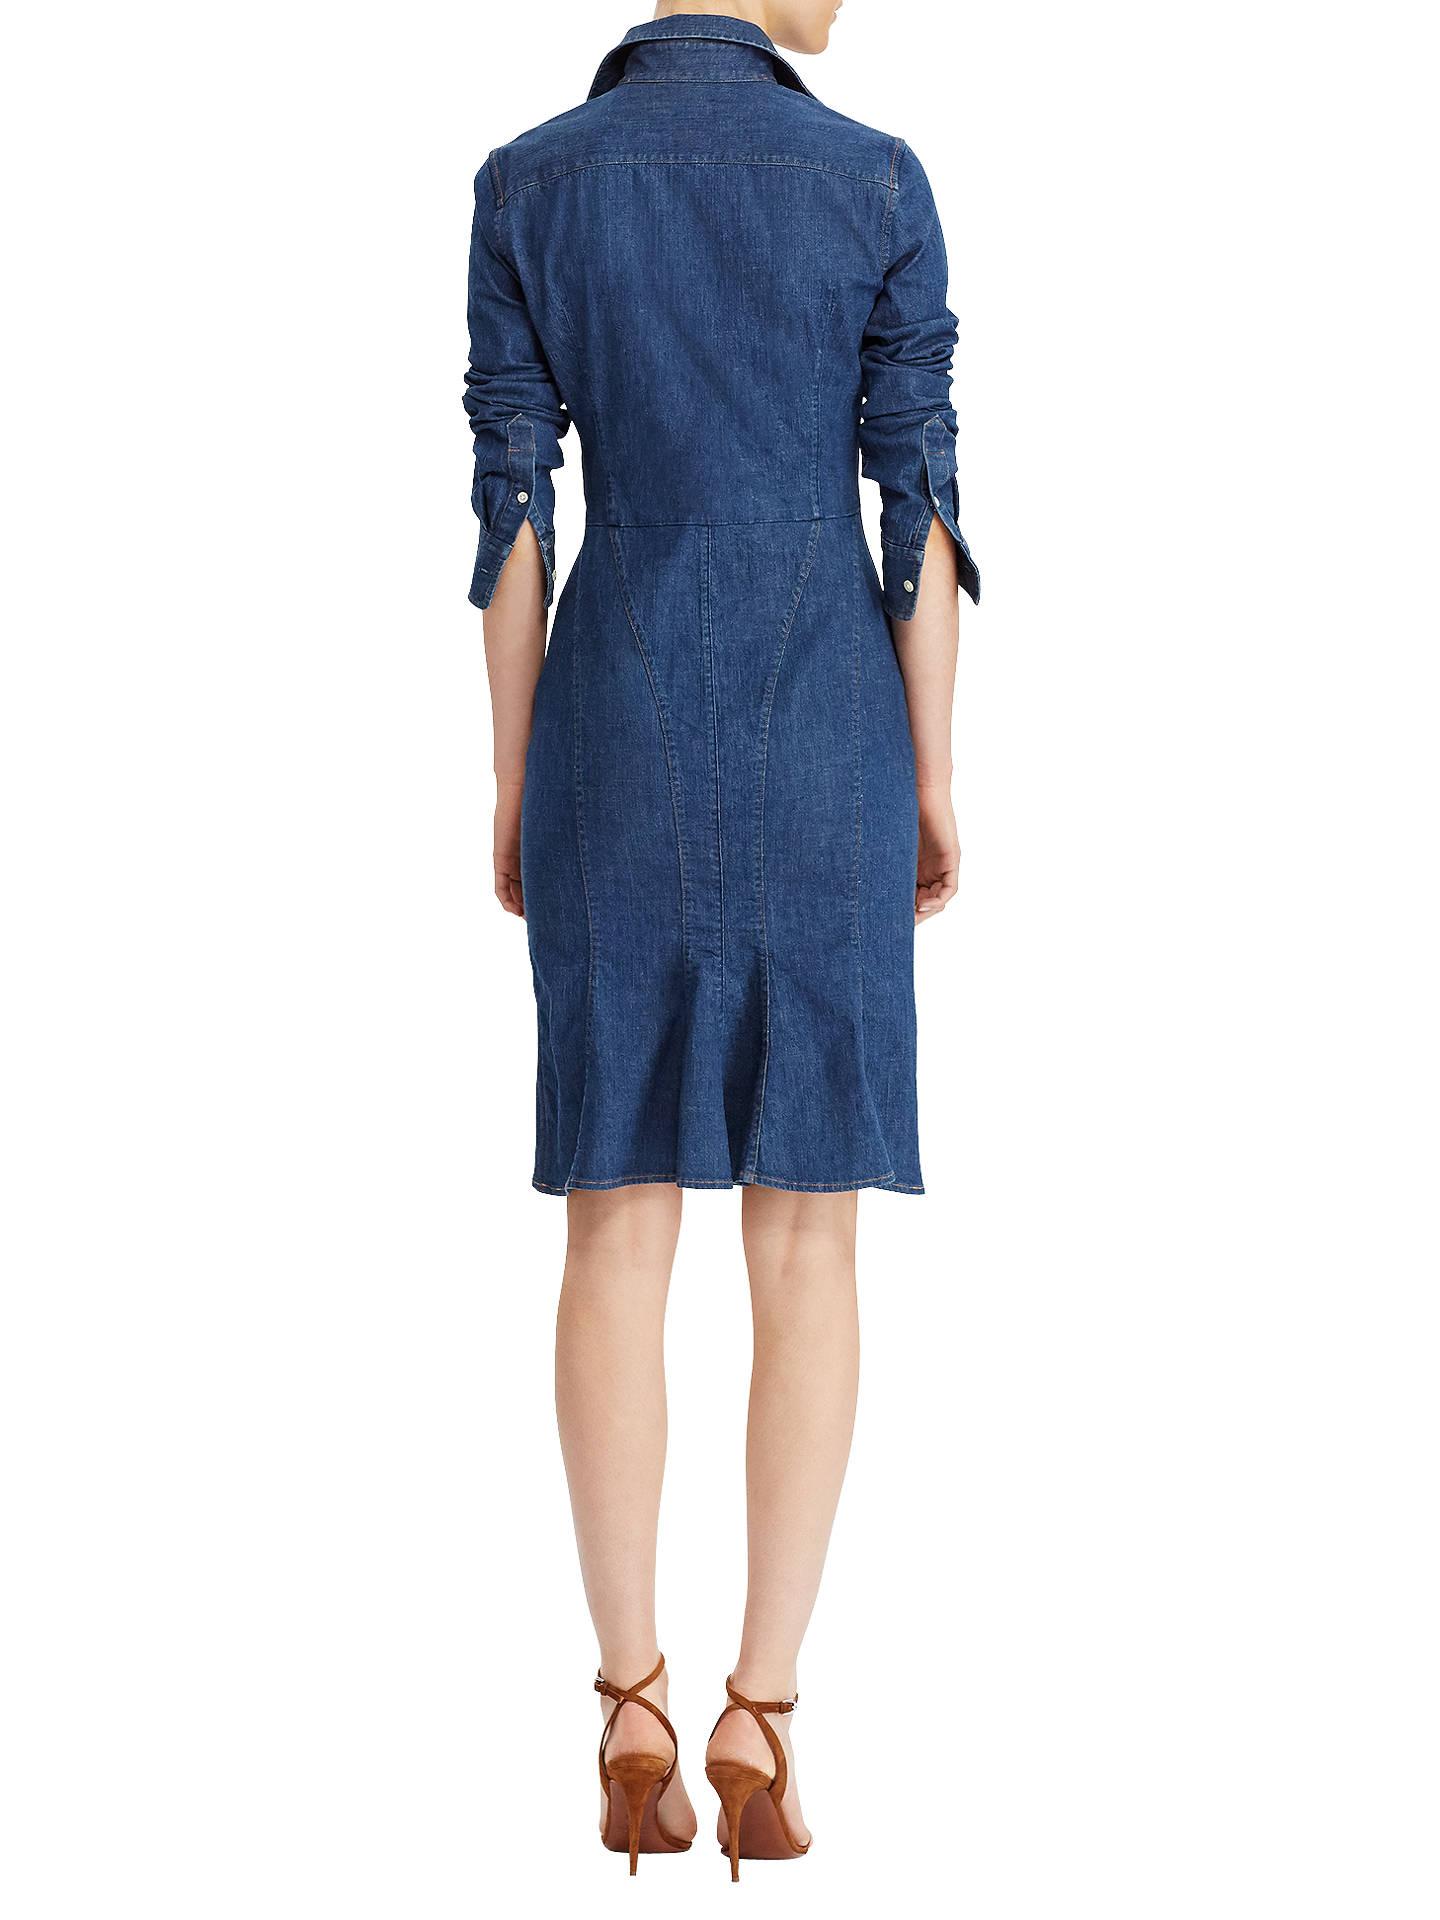 clearance prices new specials uk availability Polo Ralph Lauren Stretch Denim Shirtdress, Medium Indigo at John ...